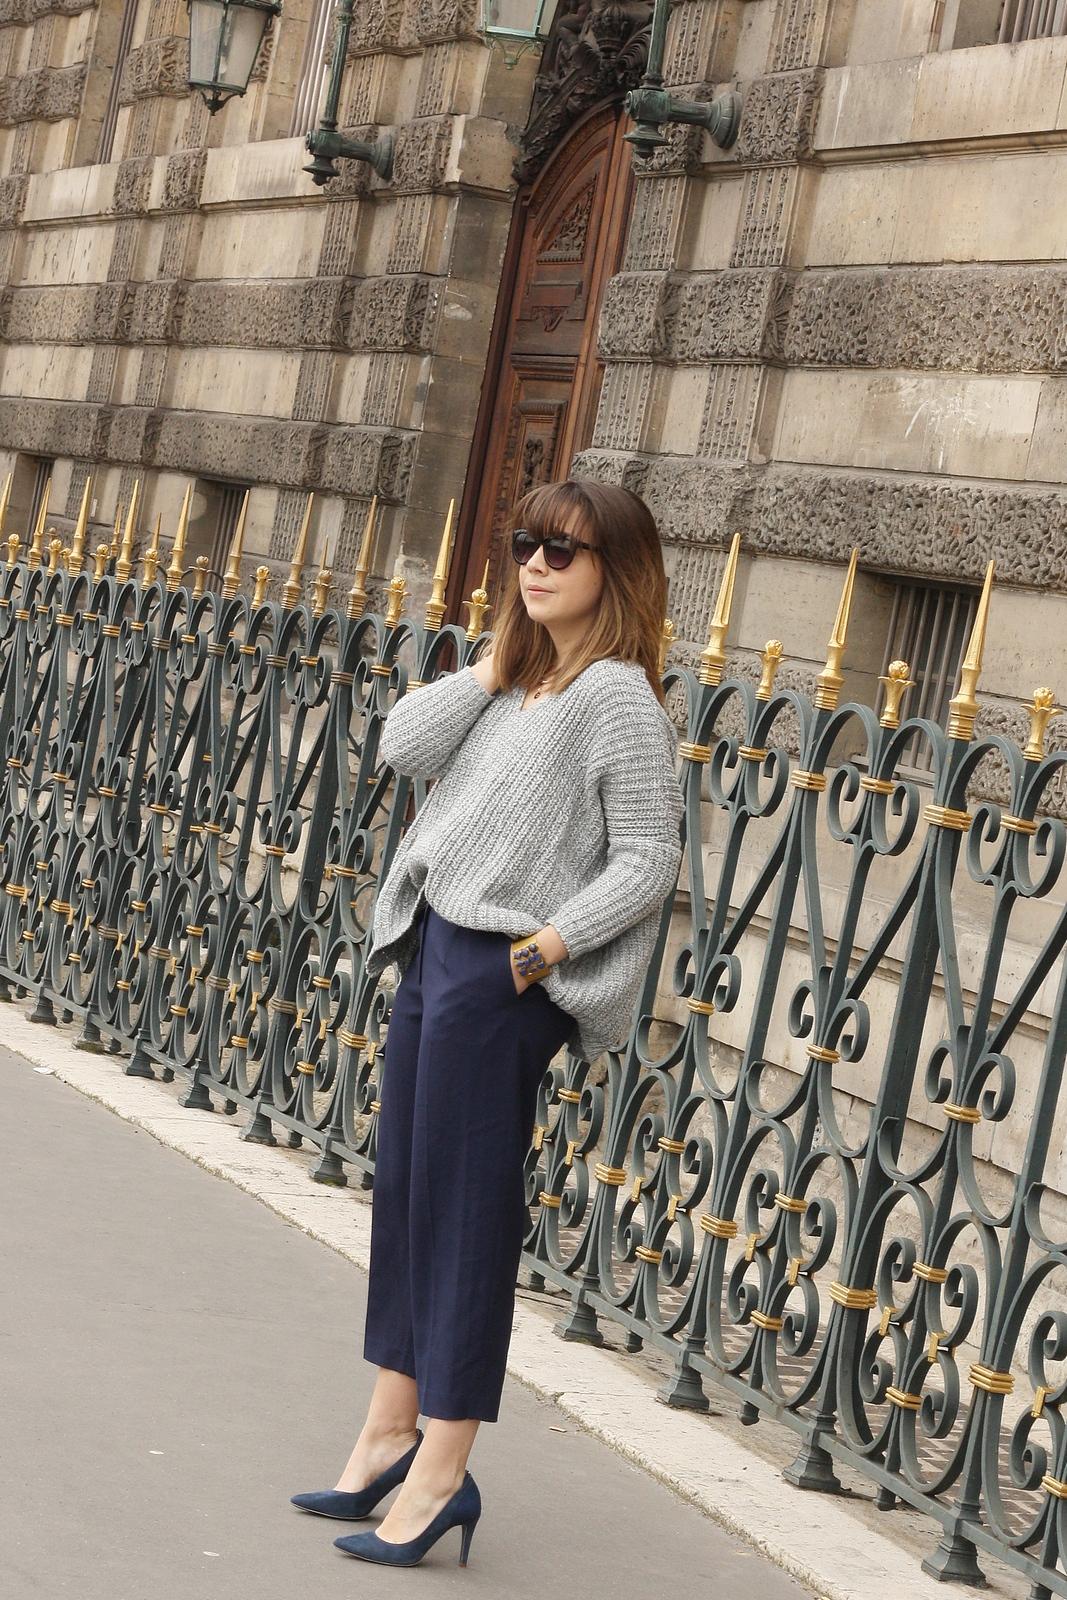 Blog mode femme Paris - Du style, Madame - Streetstyle - jupe culotte navy